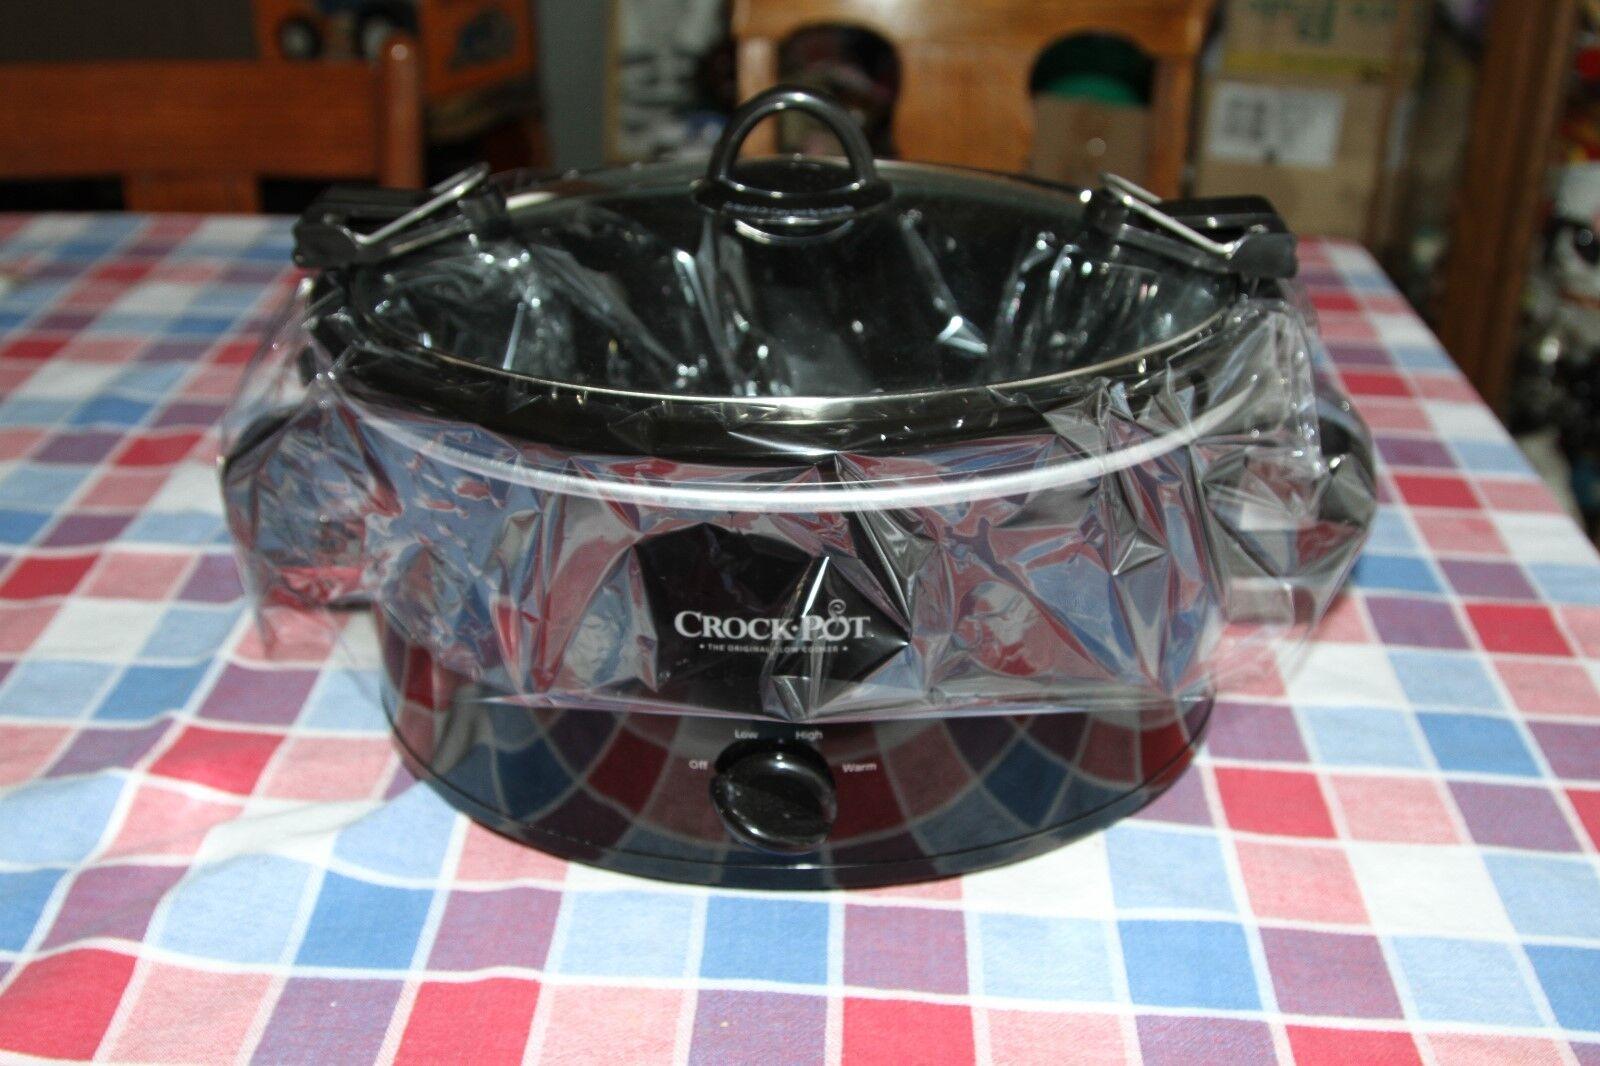 "Crock-pot Liners slow cooker Liners  4ct 10CT 20CT,40CT 23""x"